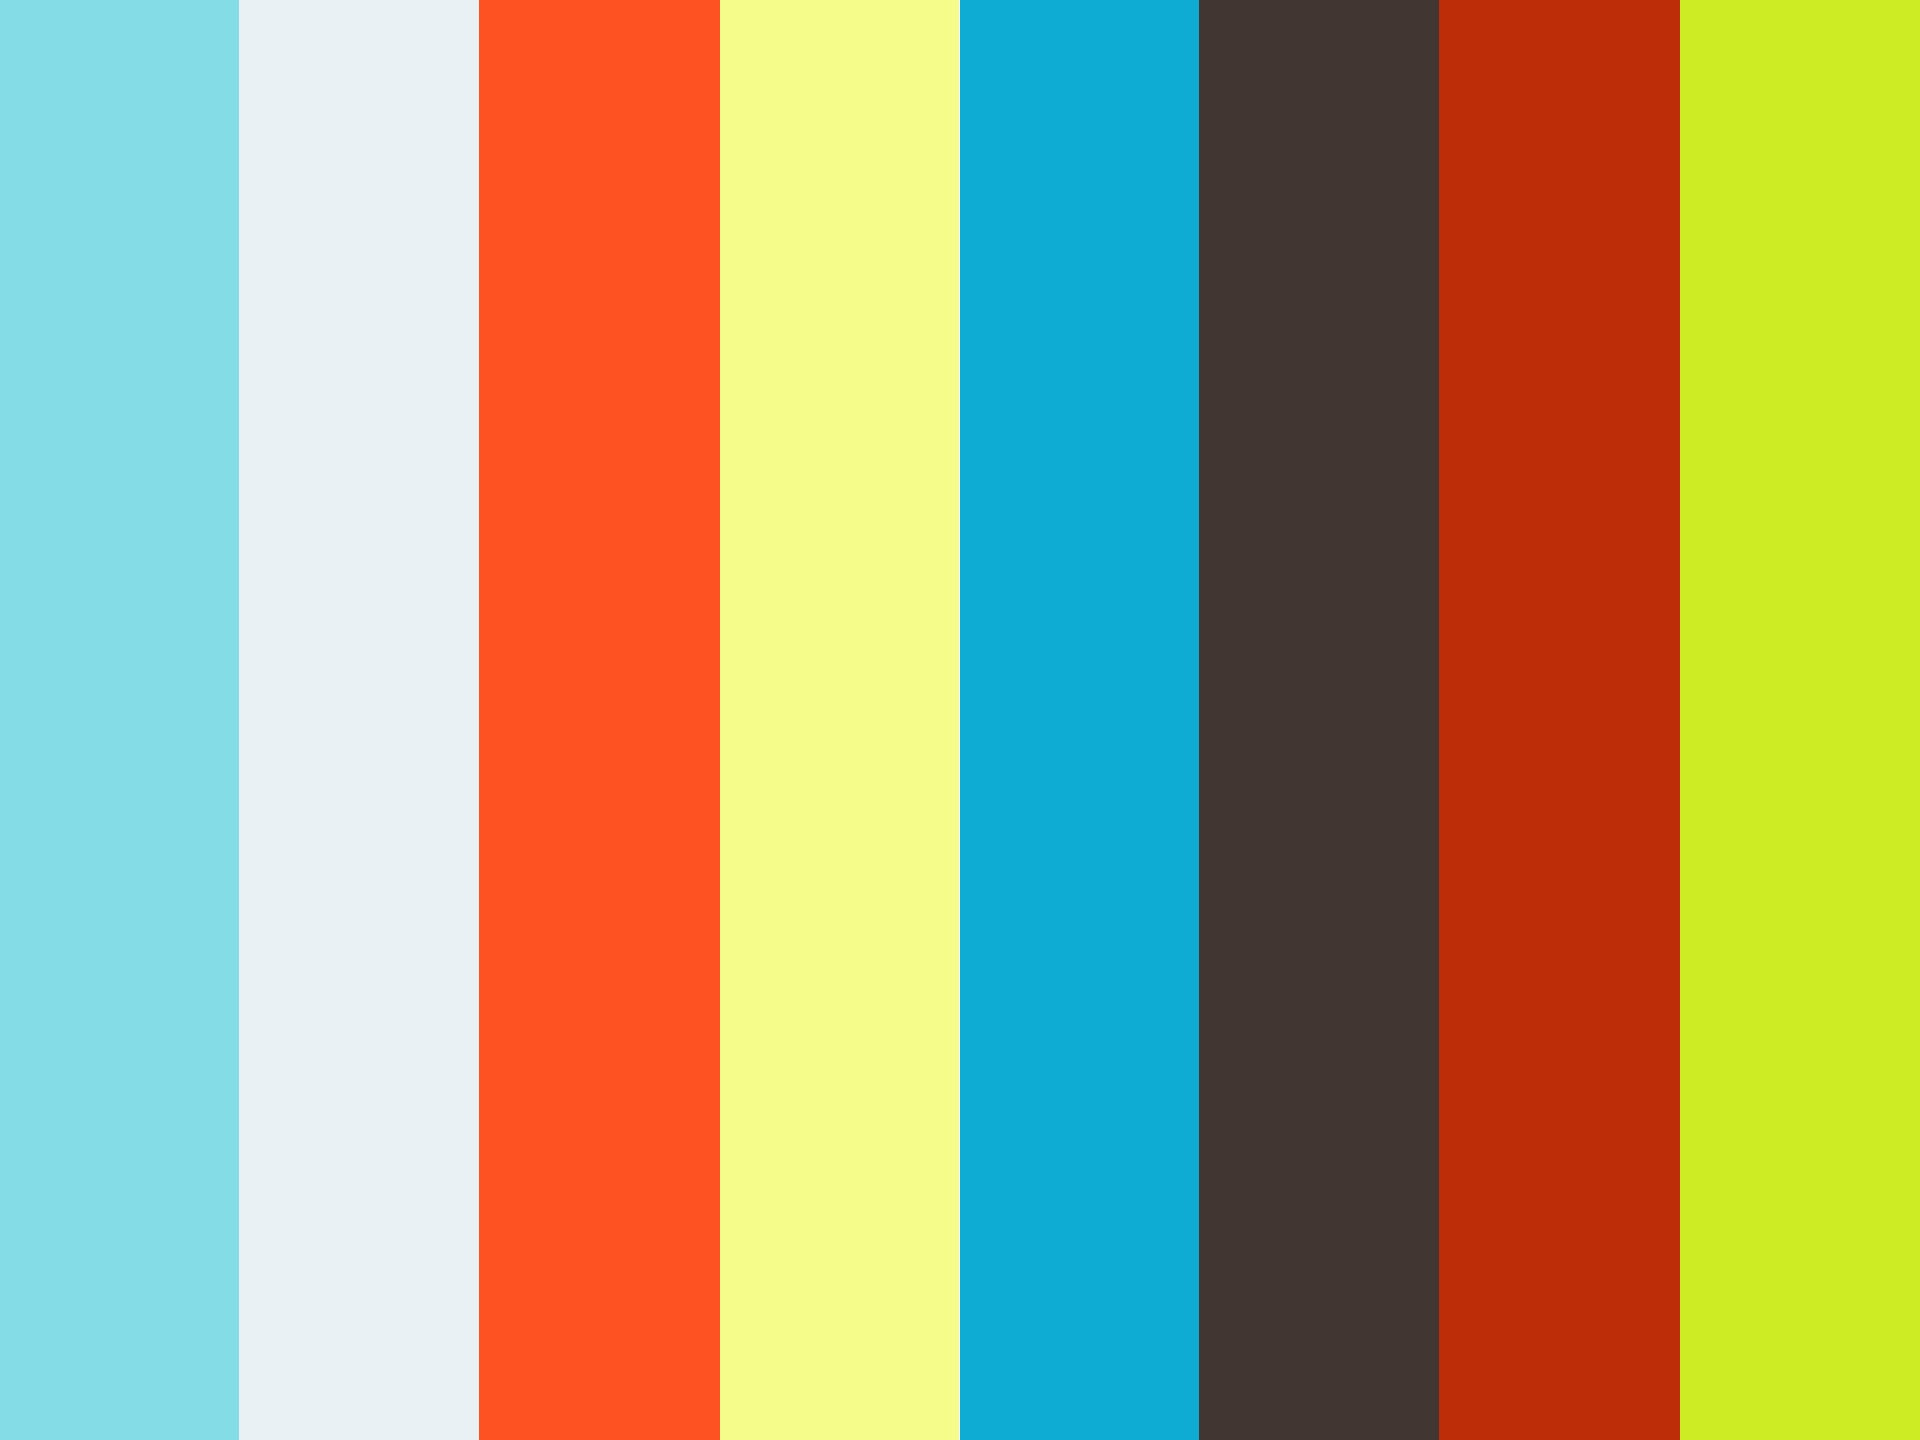 MERCEDES BENZ BRABUS S63 - BLACK - 2016